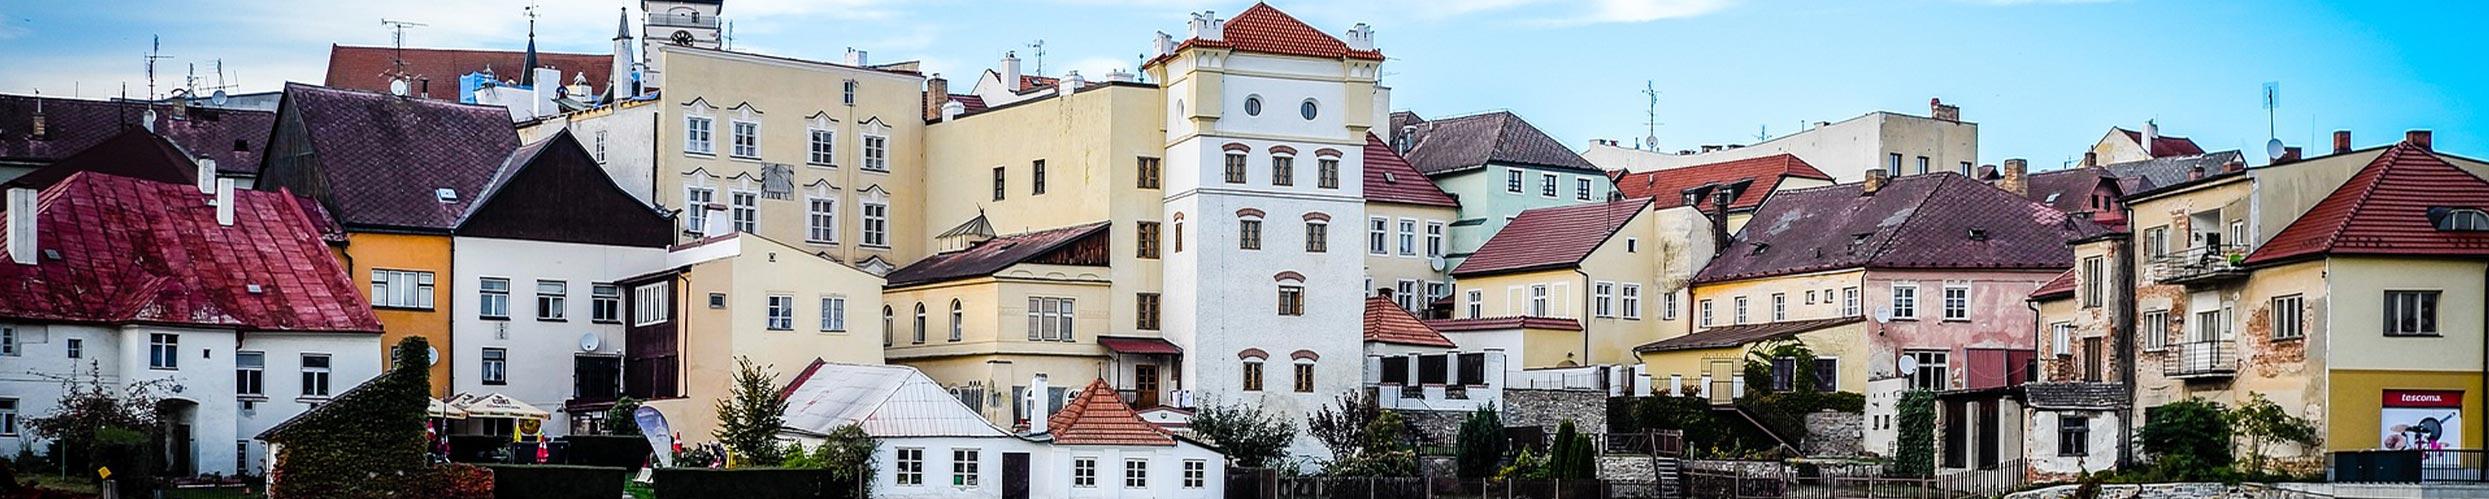 Zahnmedizin studieren Hradec Kralove